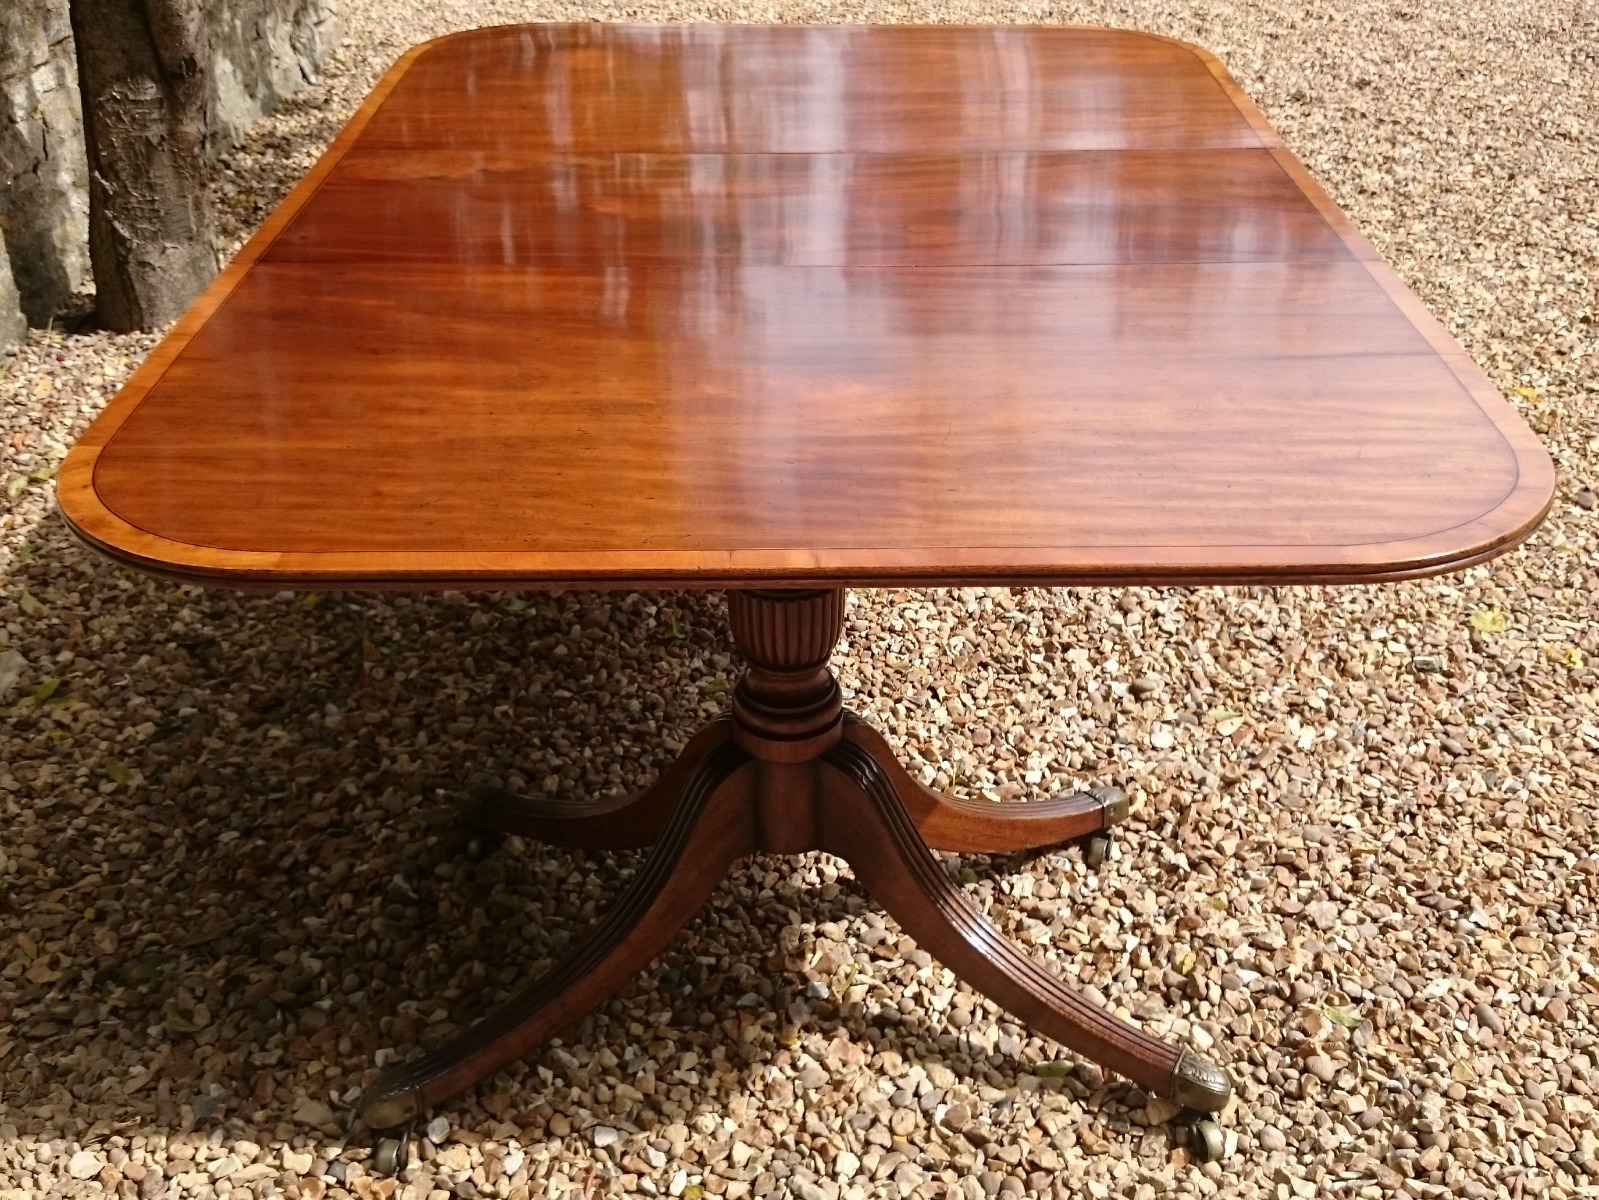 Antique Pedestal Dining Tables – Hares Antiques Regarding 2017 Sevinc Pedestal Dining Tables (View 11 of 15)